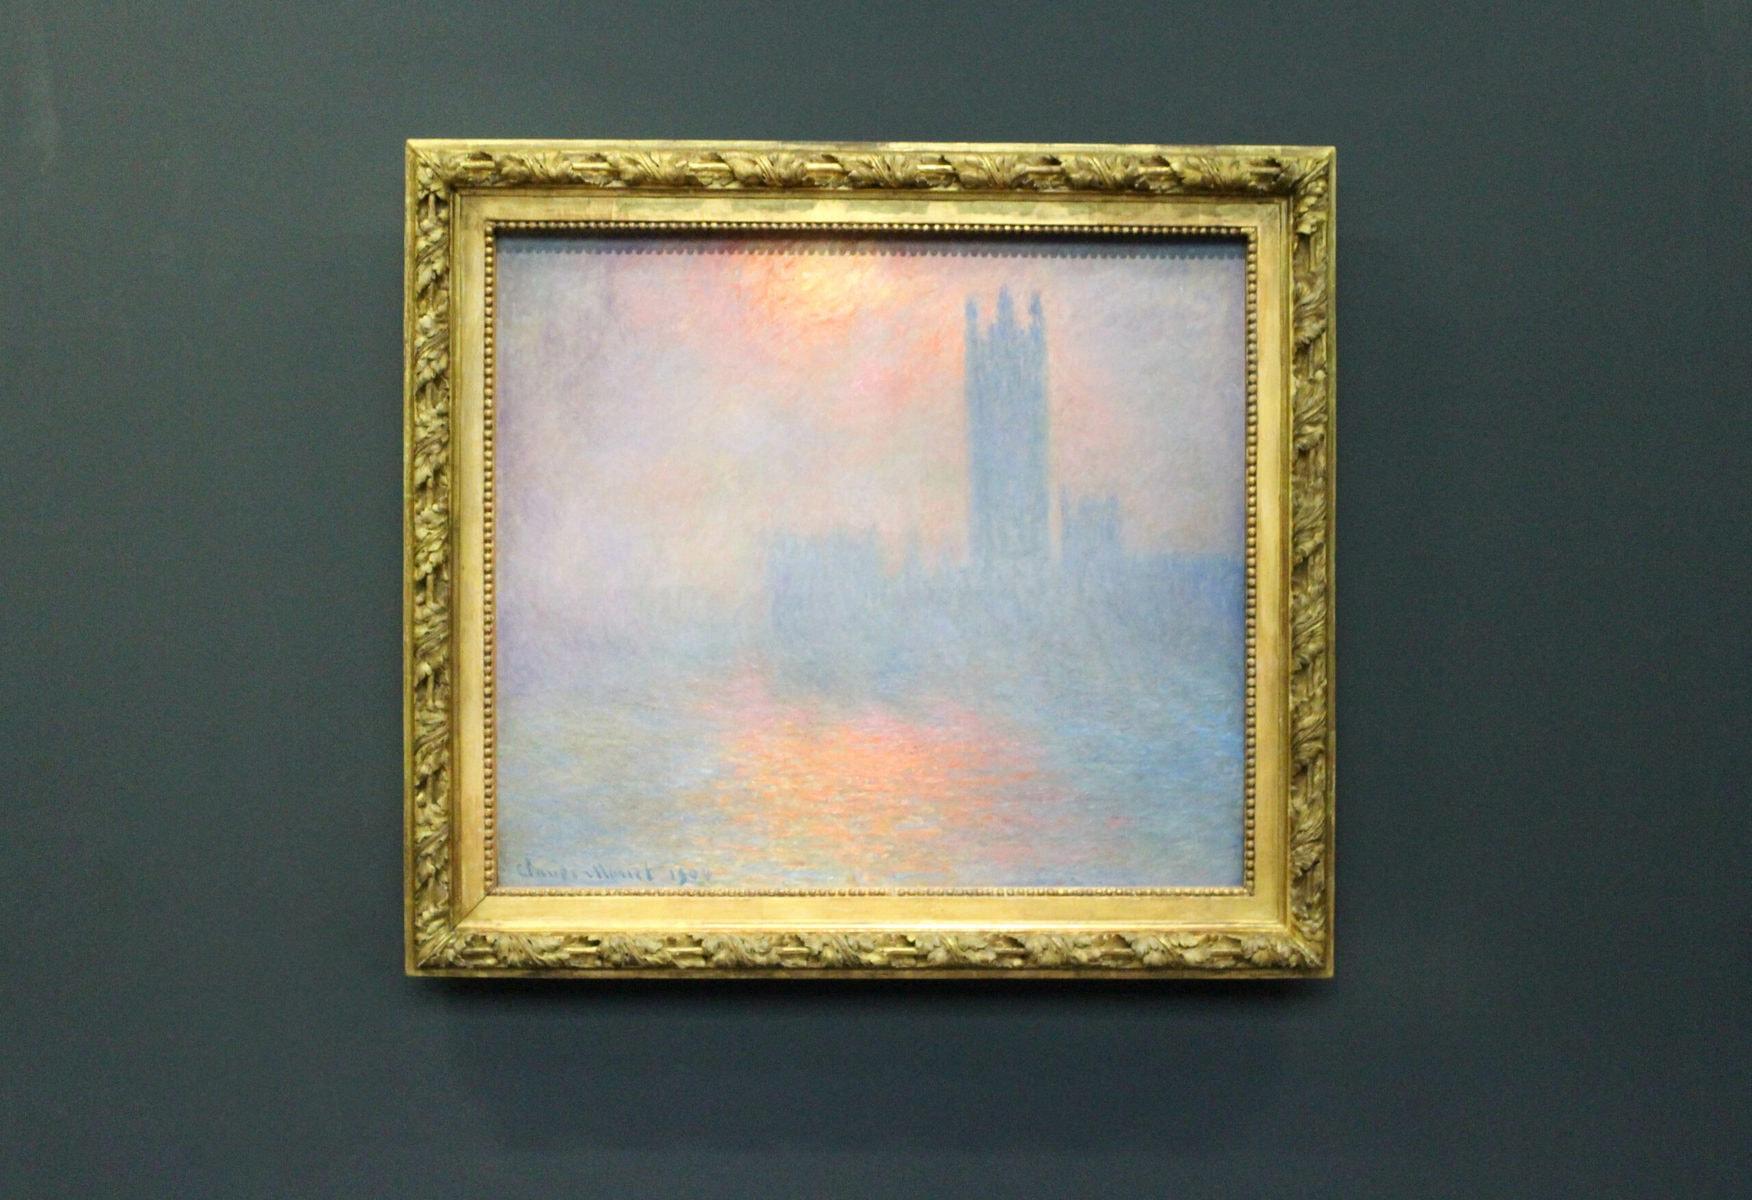 Claude Monet, London, Parlament, die Sonne durchbricht den Nebel, 1904, Öl auf Leinwand, 81,50 x 92,50 cm, Musée d'Orsay, Paris